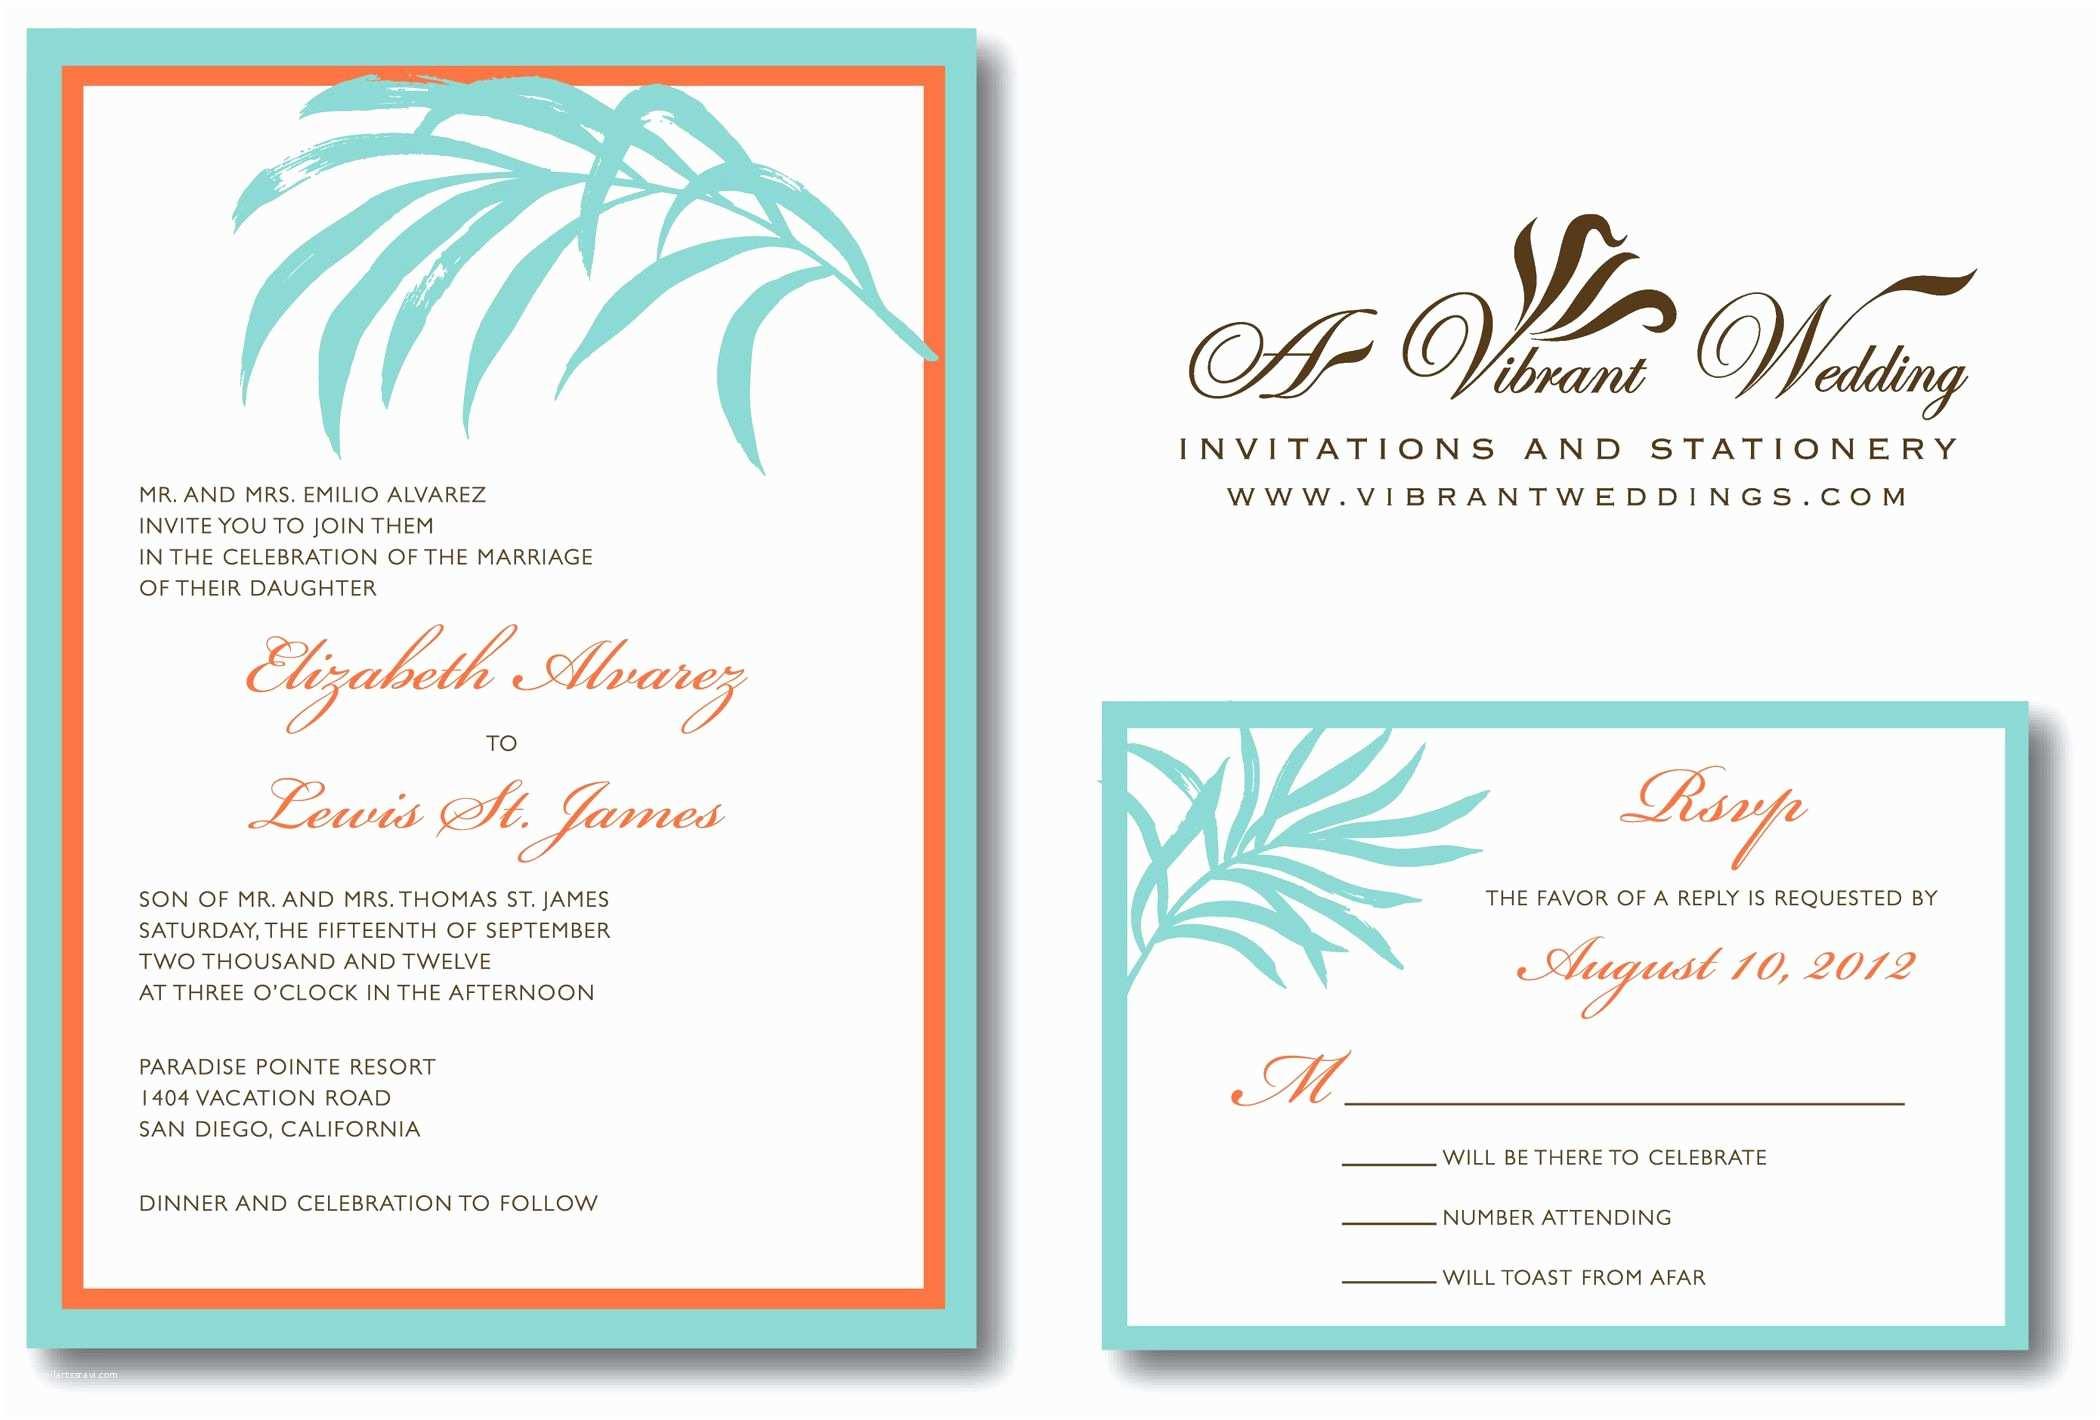 Wedding Invitations Wording Beach Wedding Invitations Wording Beach Wedding